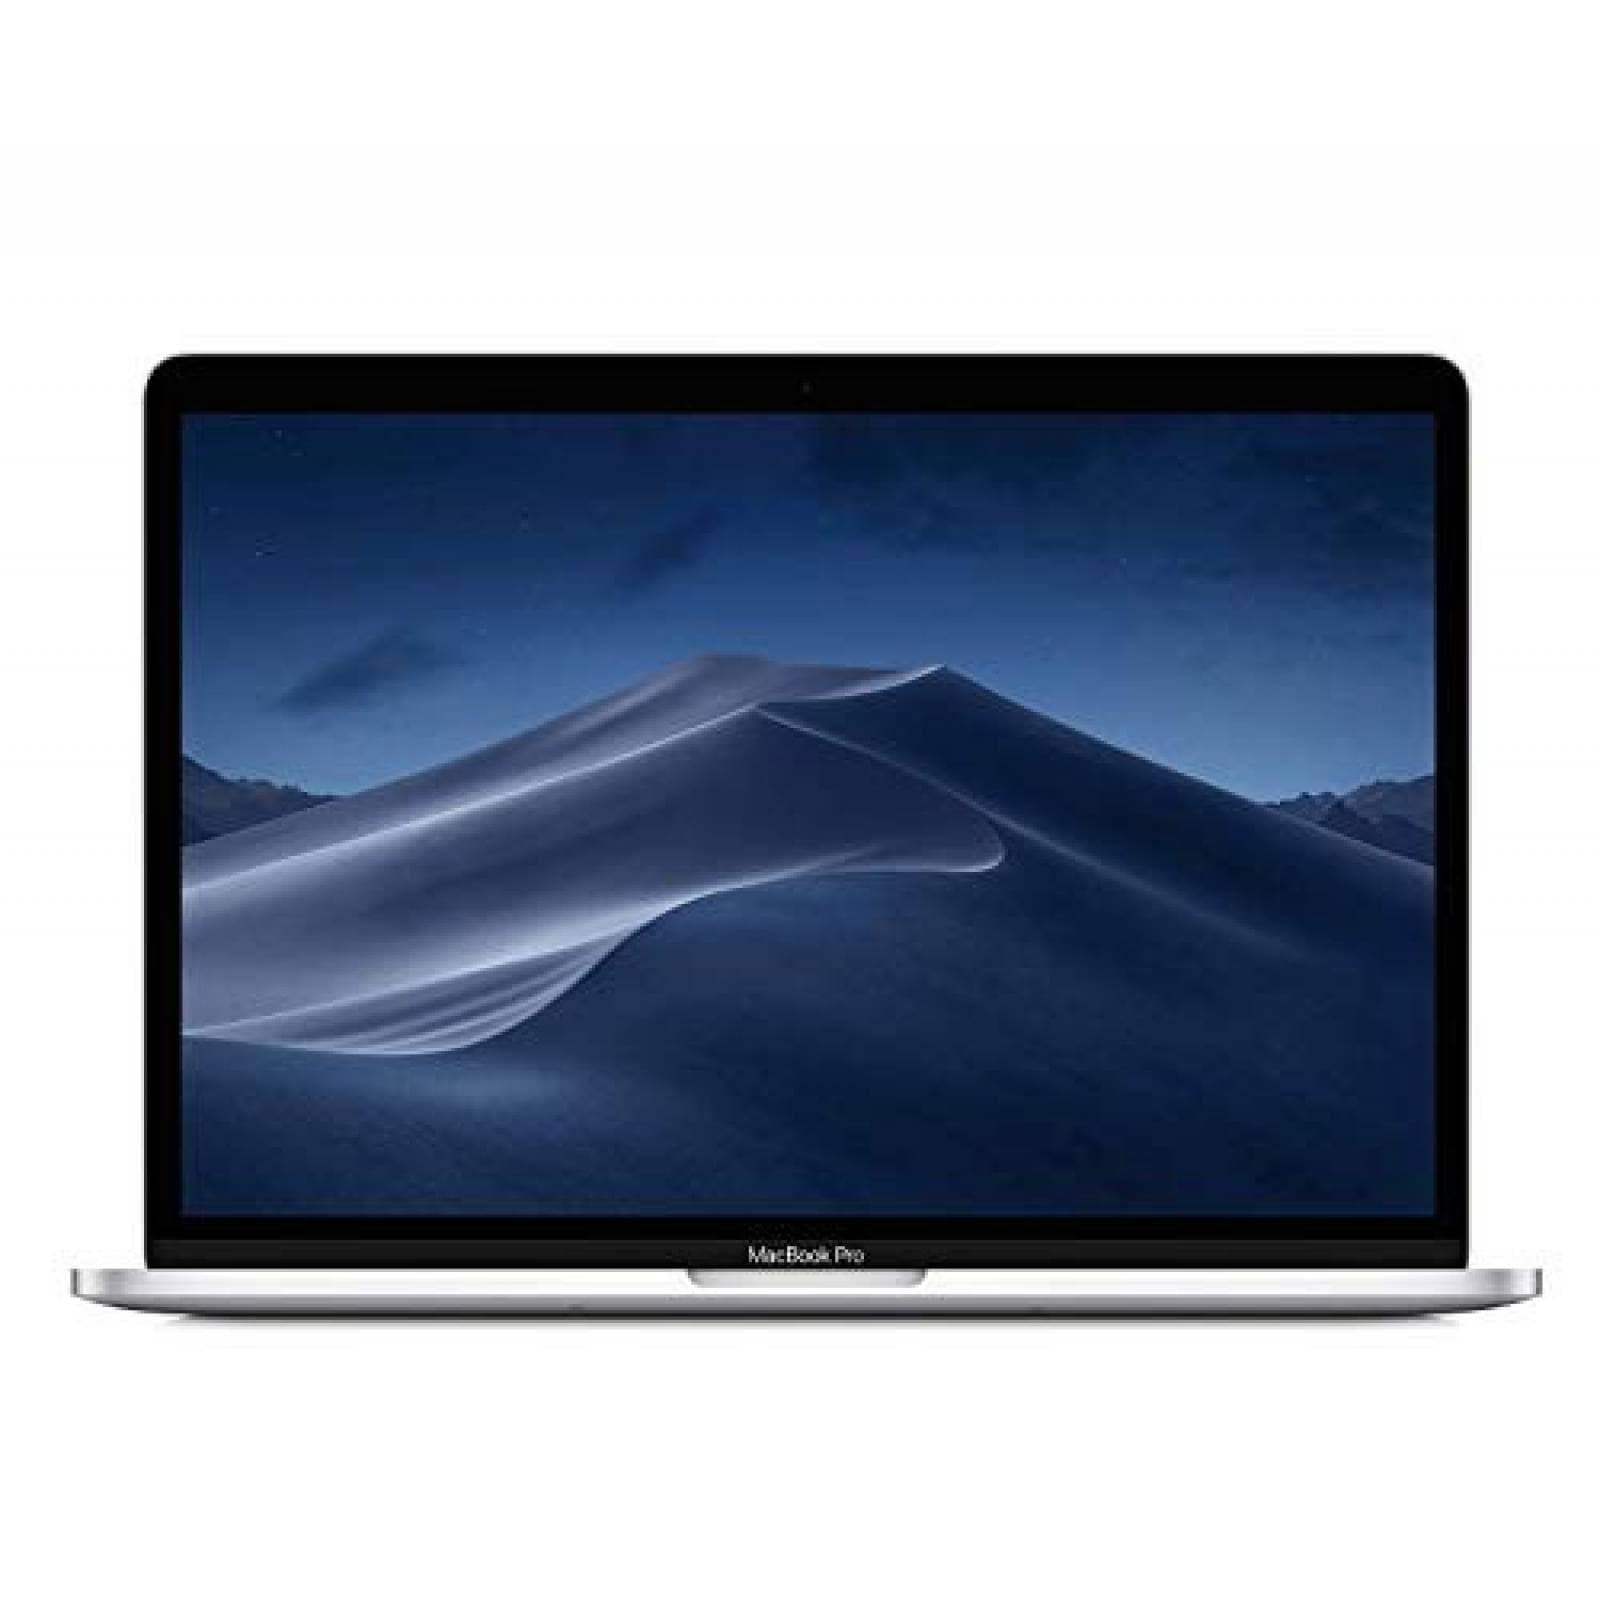 "Laptop Apple MacBook Pro 13"" 256 GB 4.8 GHz -Plata"